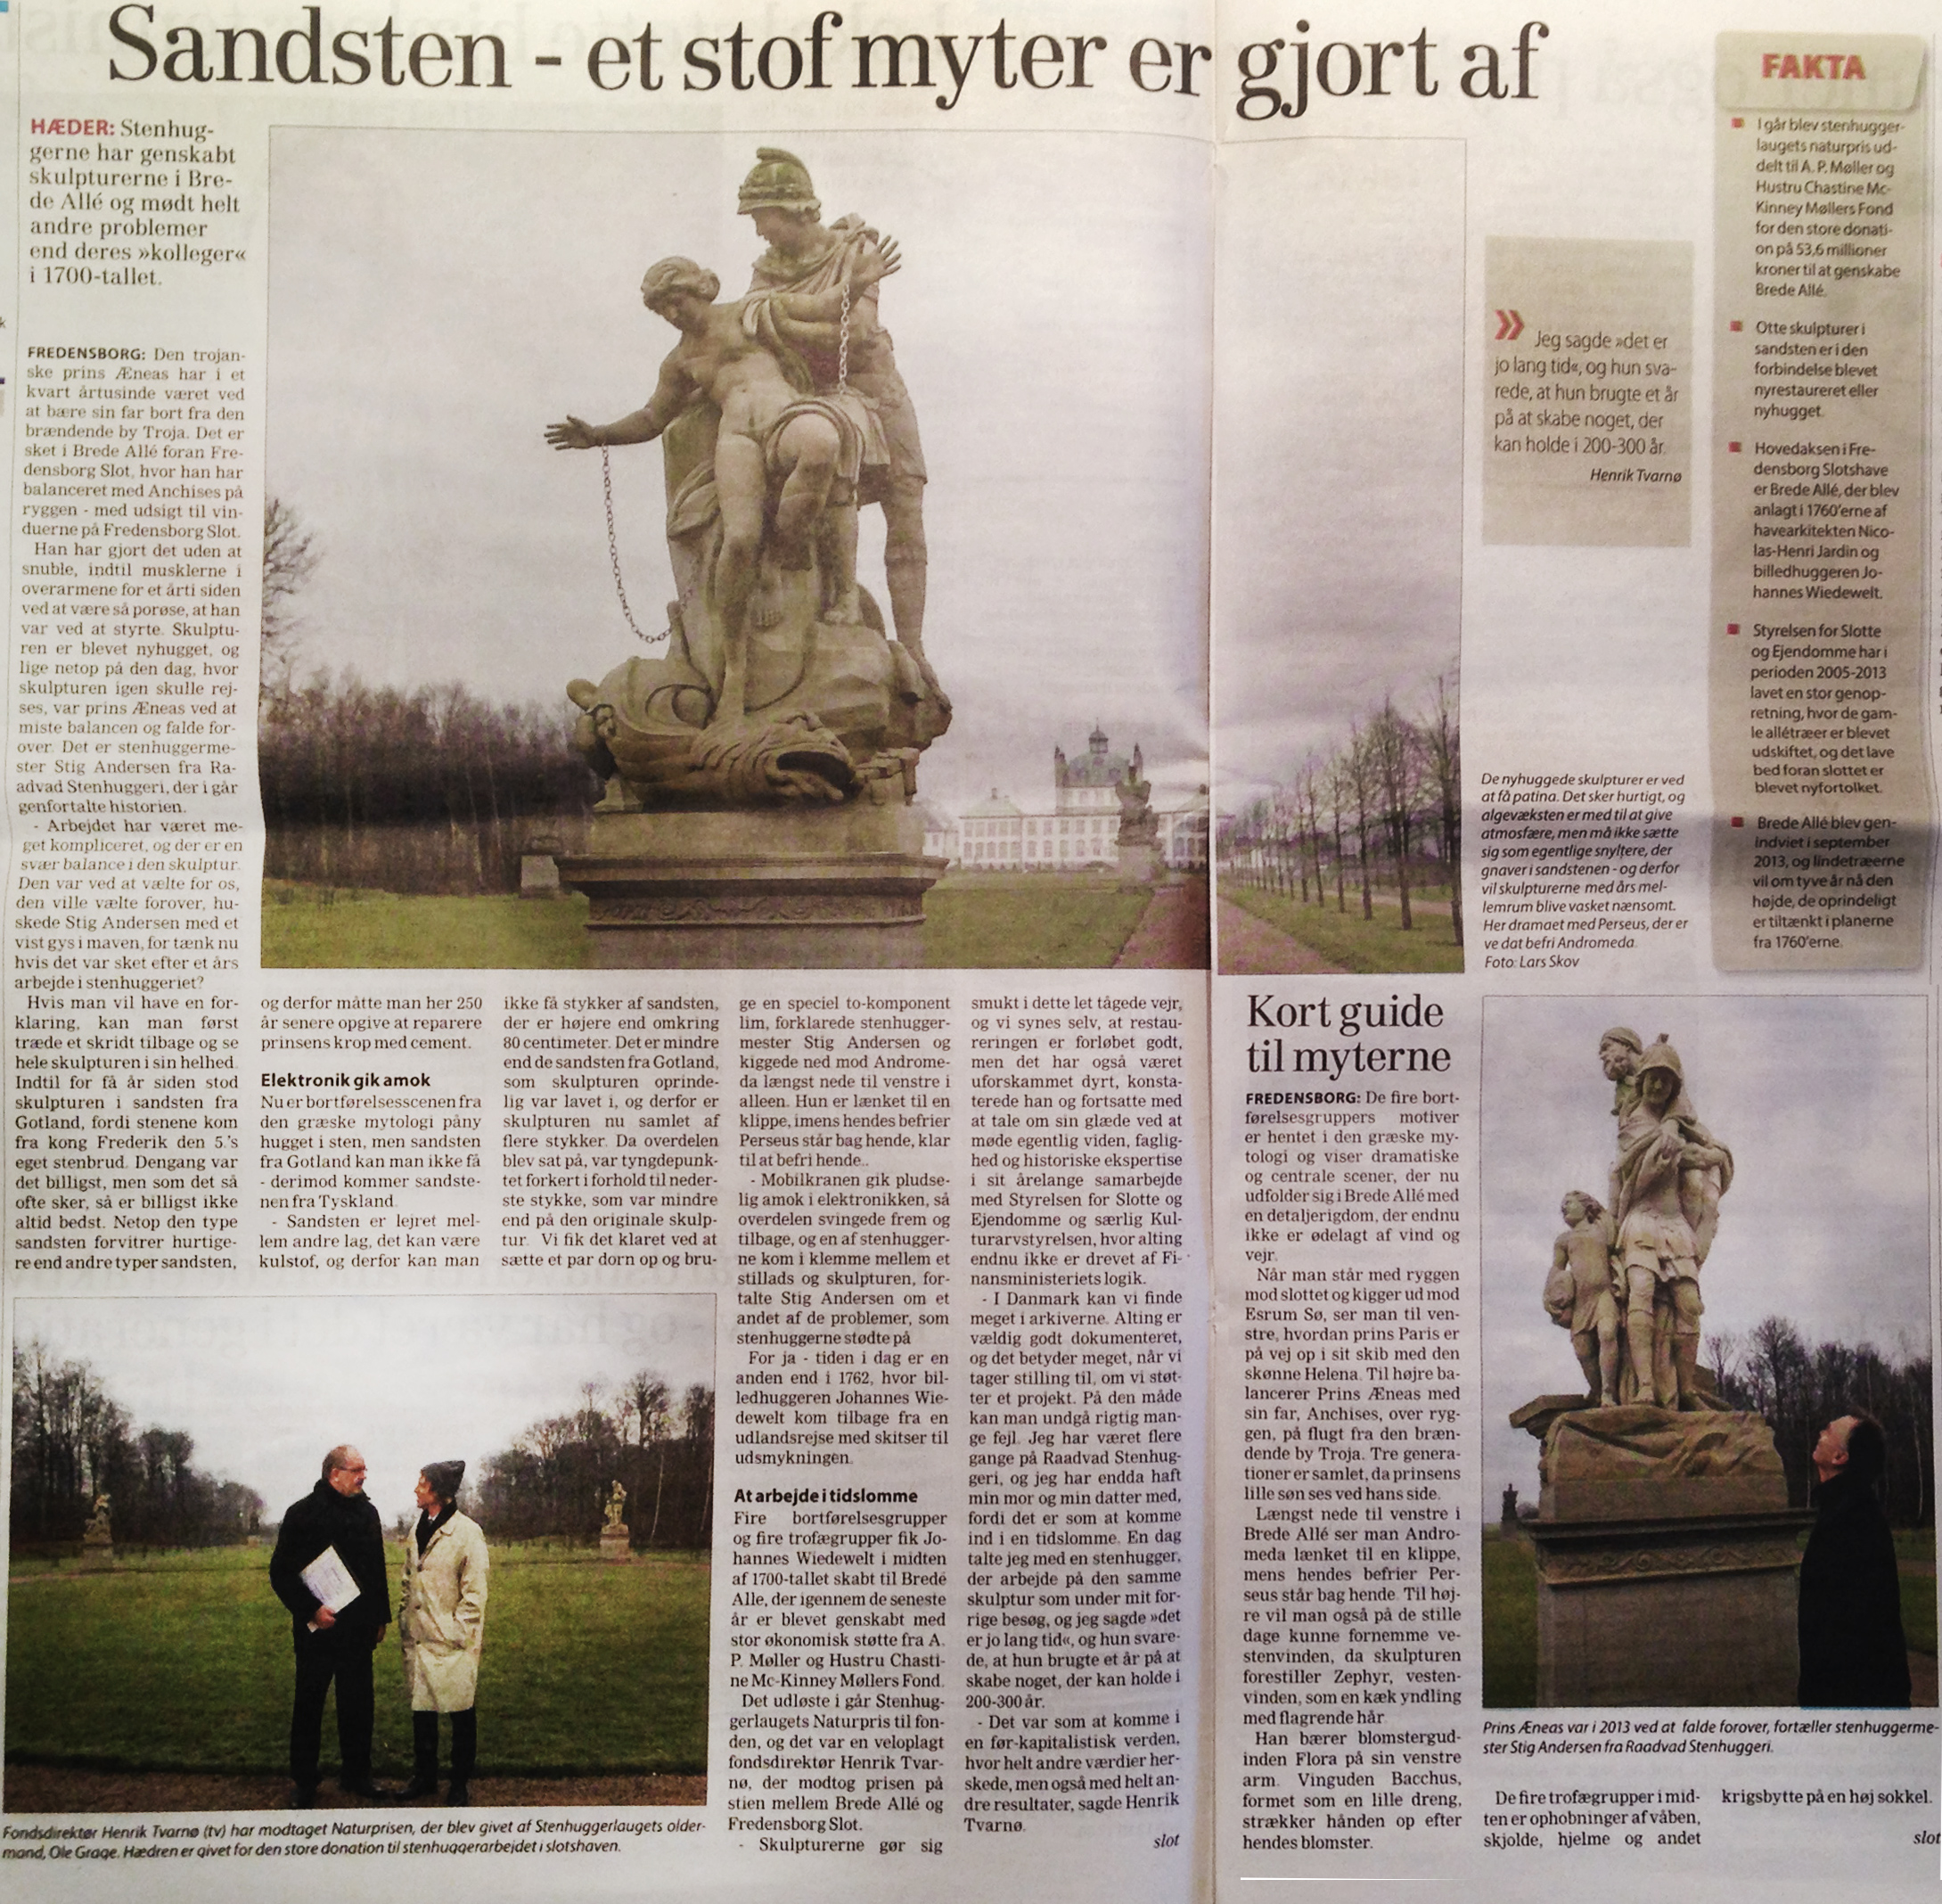 Artikel_-sandsten_justeret